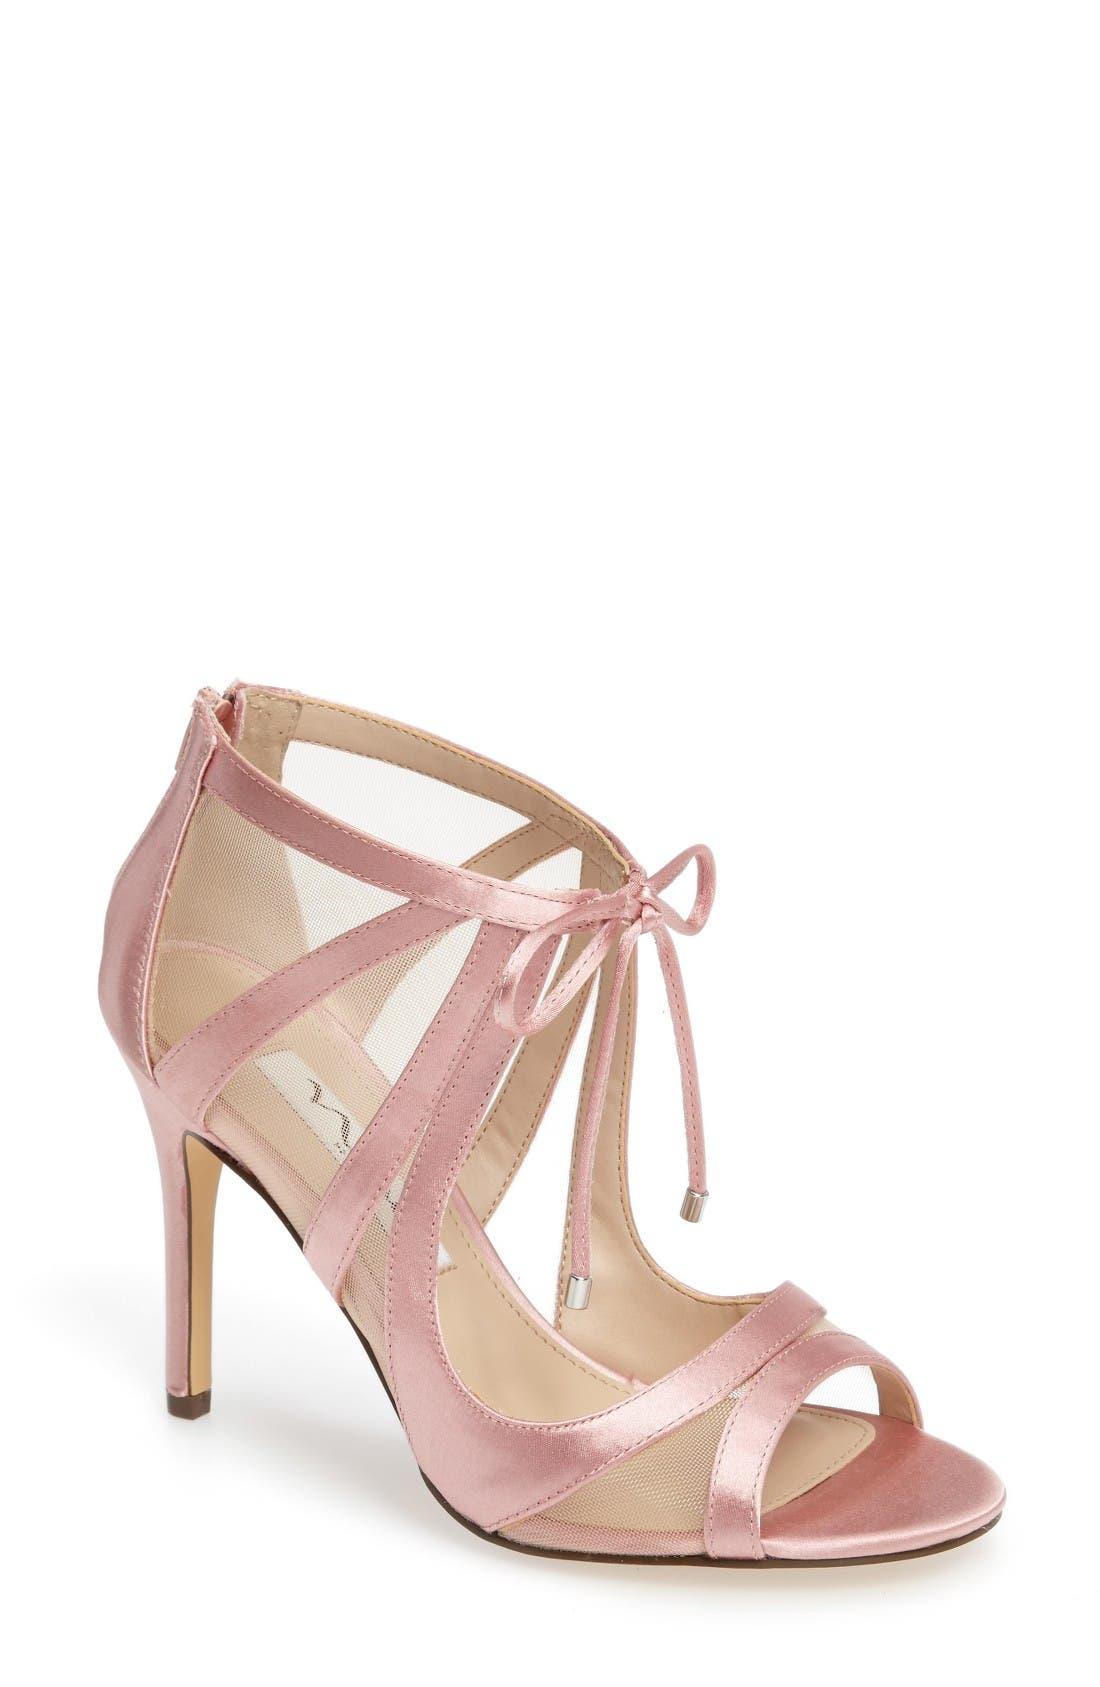 Main Image - Nina Cherie Illusion Sandal (Women)